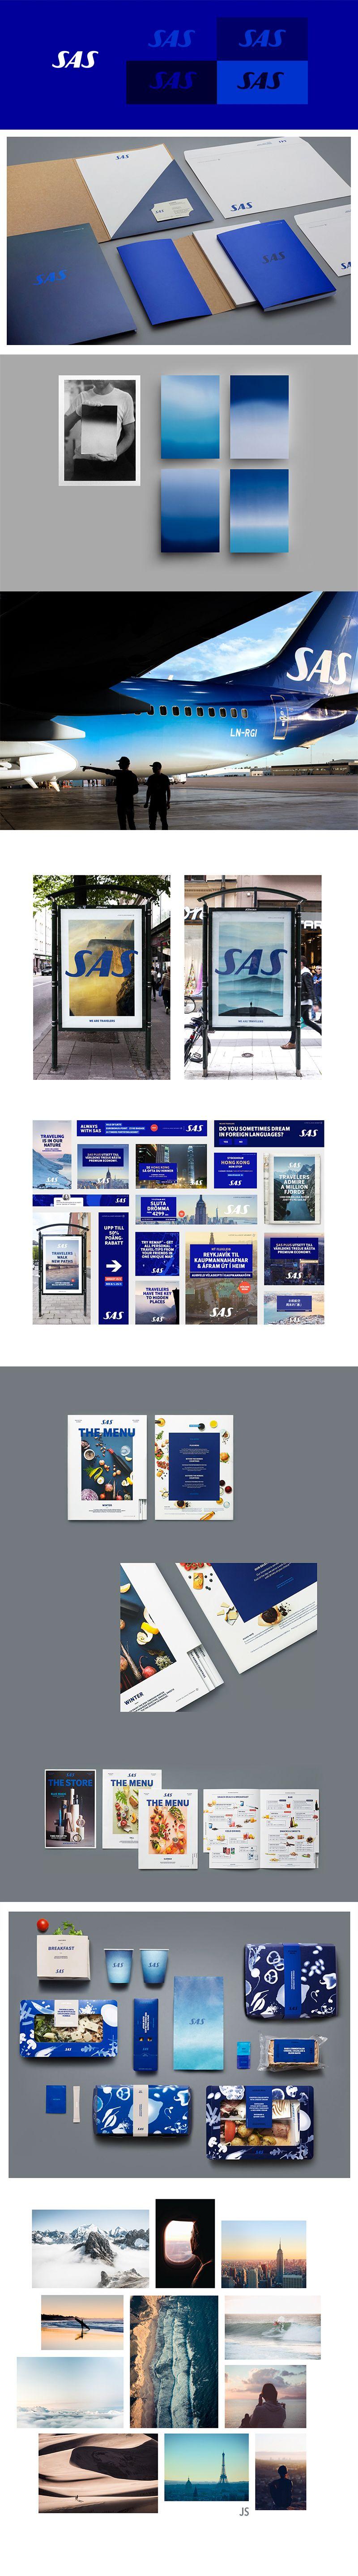 Sas Scandinavian Airlines True Travelers Brand Redesign By Bold Branding Design Amazing Airlines Branding Branding Design Fun Website Design